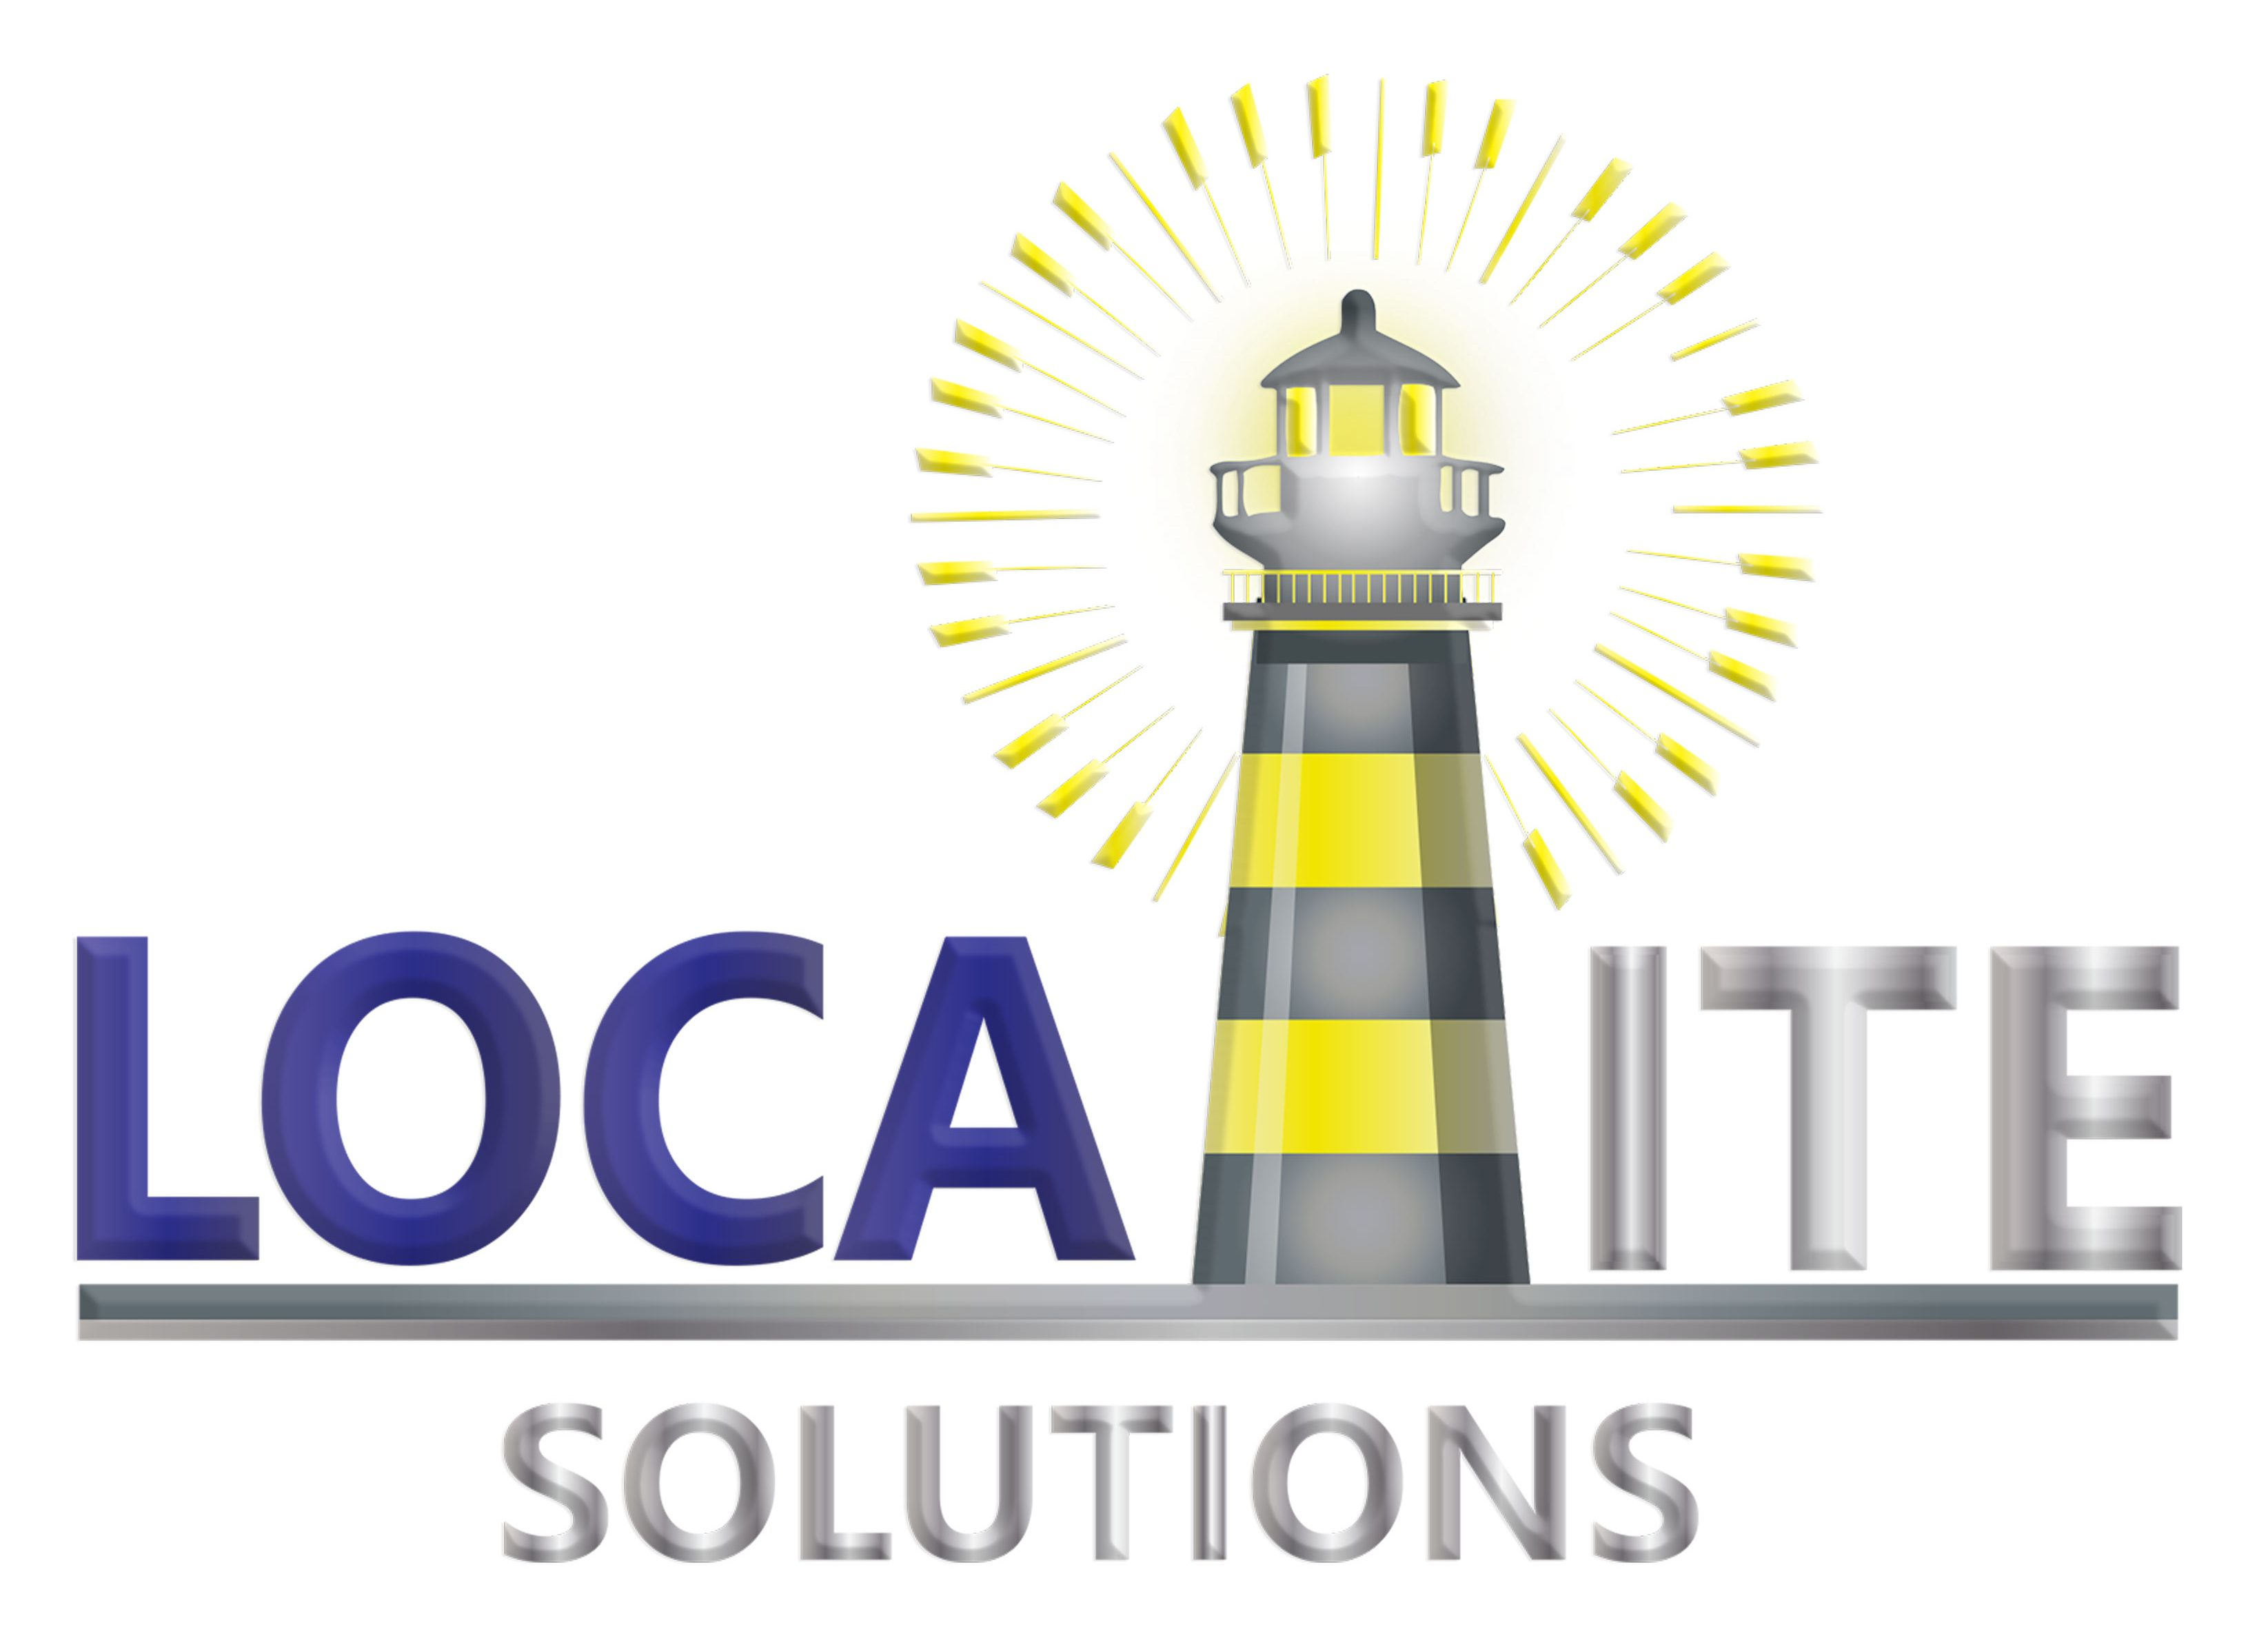 Referral Program - Localite Solutions